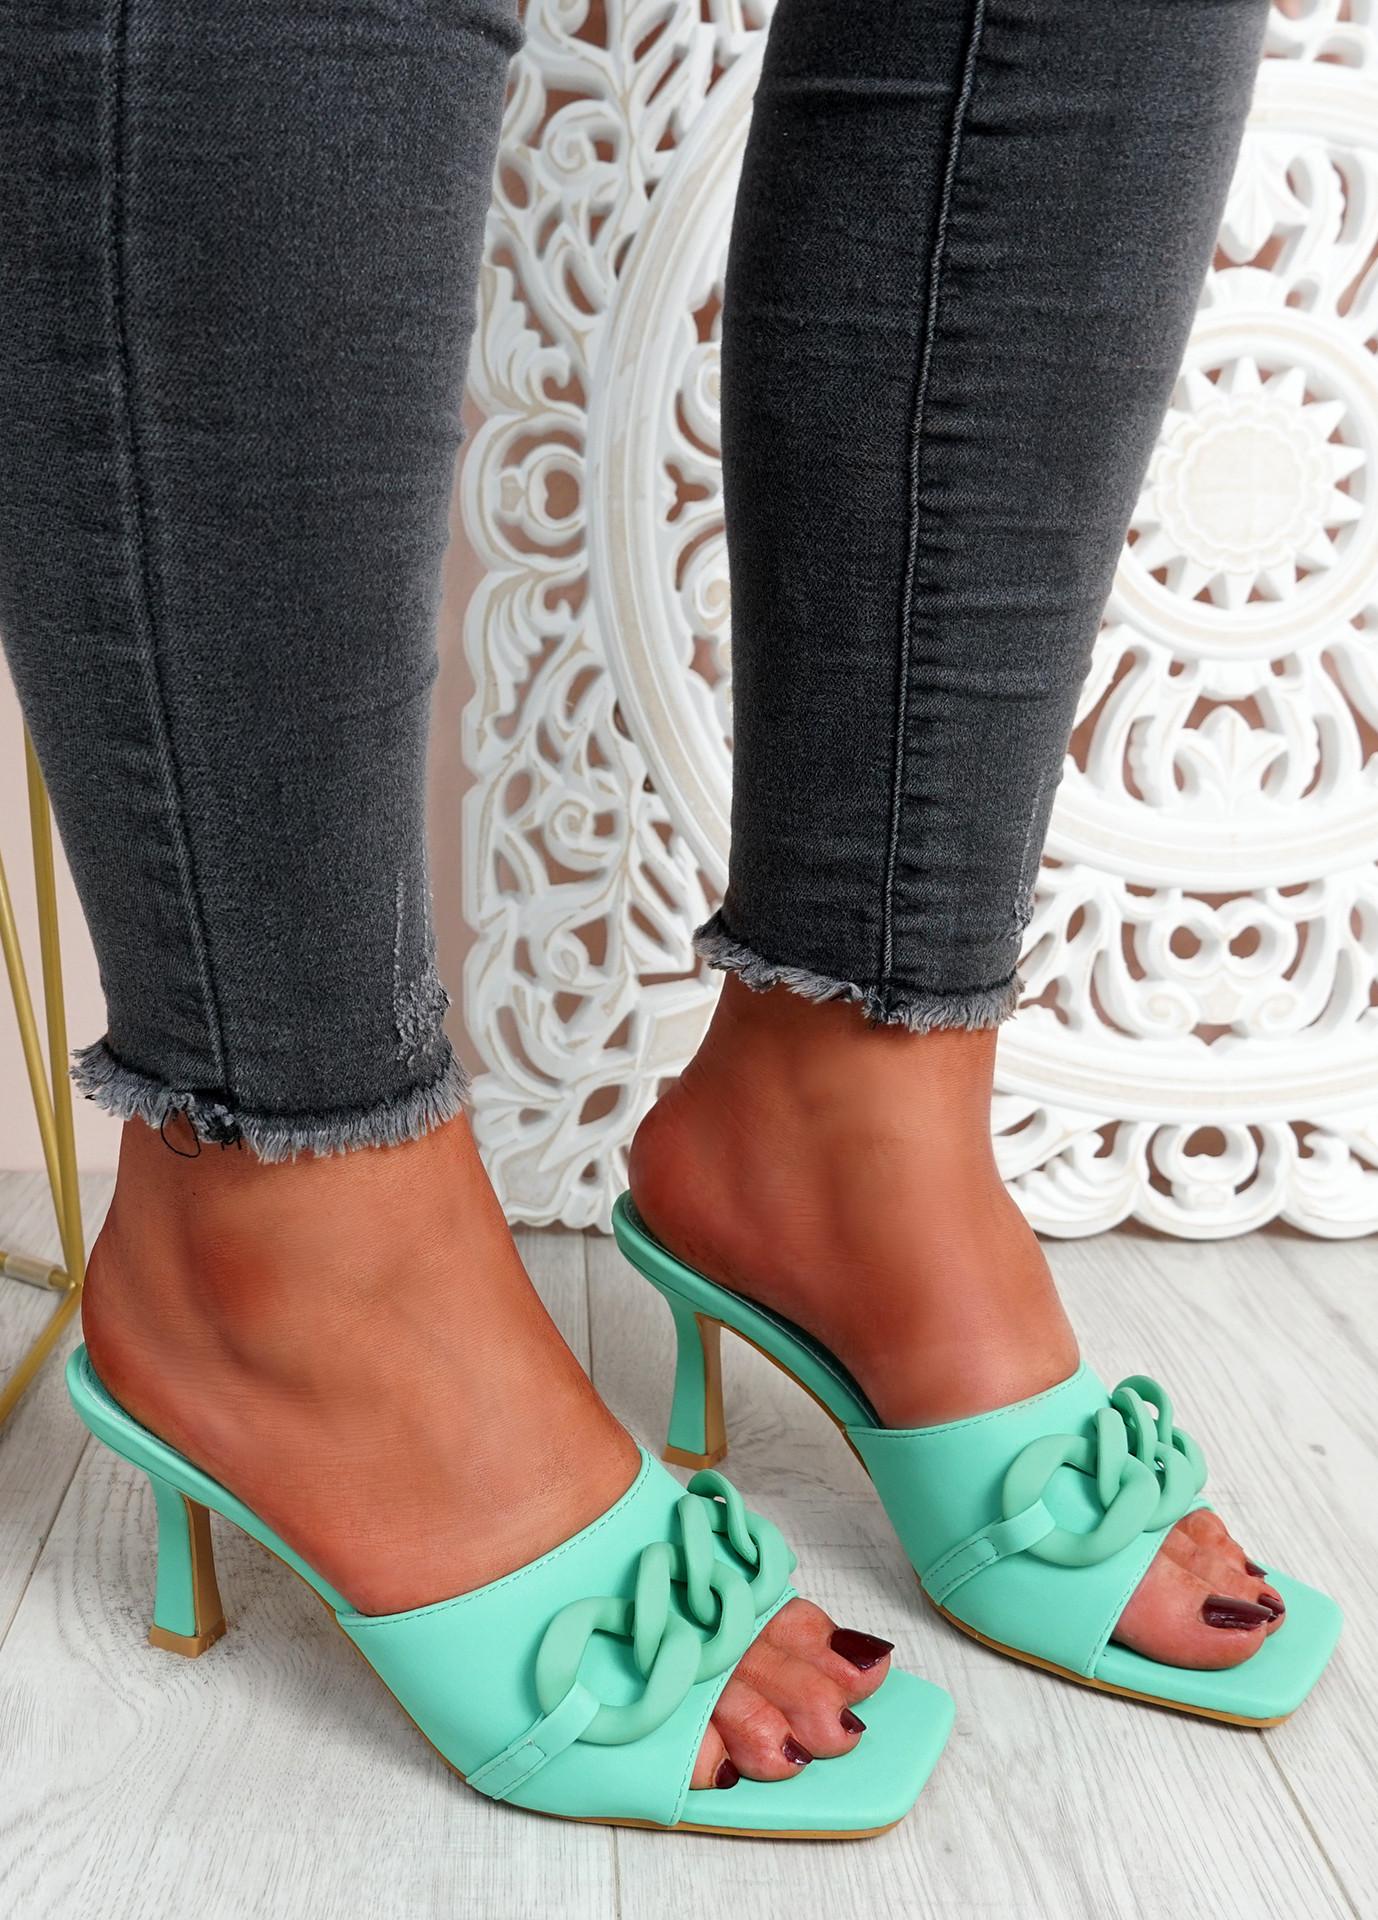 Nory Green Slip On Stiletto Sandals